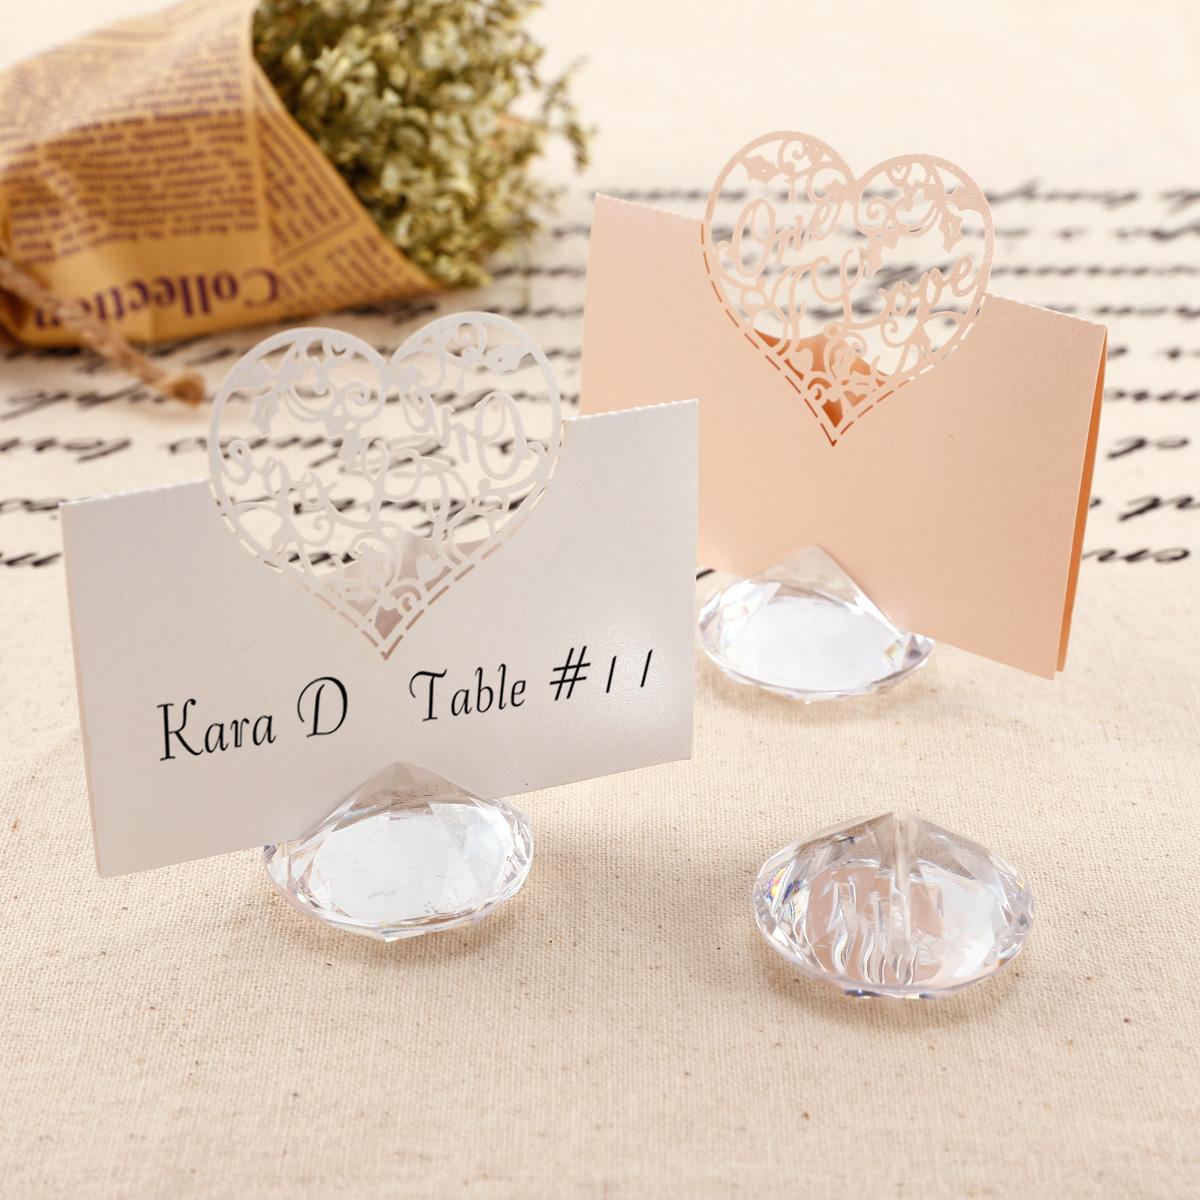 20 Acrylic/Crystal/Diamond Look Place Name Card Holders